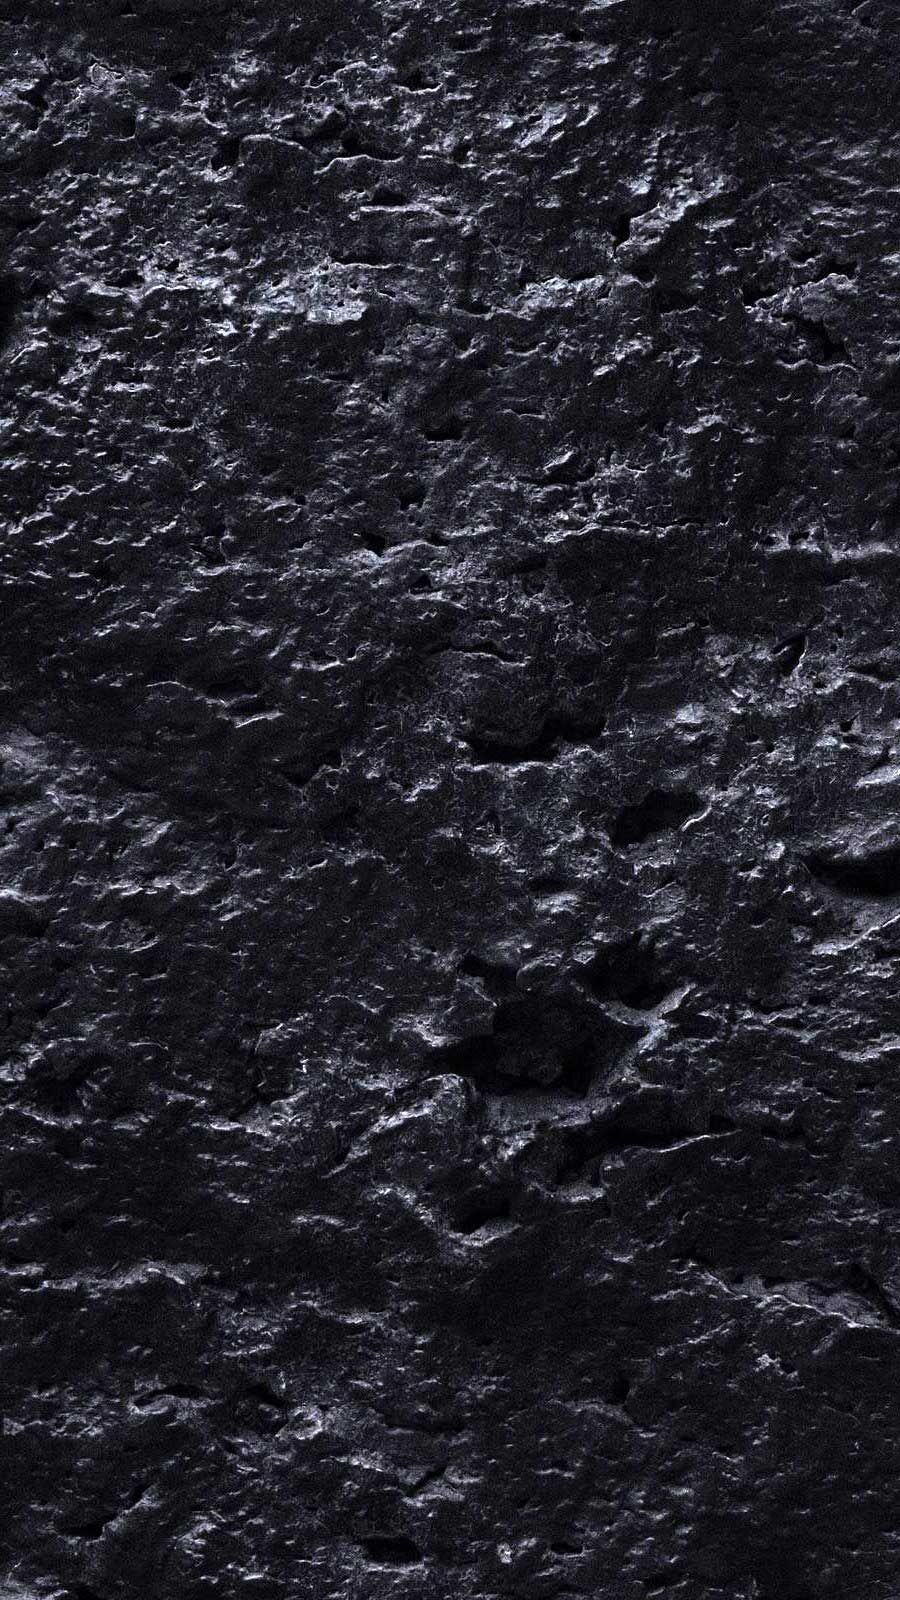 Iphone Wallpaper Te Ture Black Stone Hd Iphone Wallpaper Rock Iphone Wallpaper Iphone Wallpaper Night